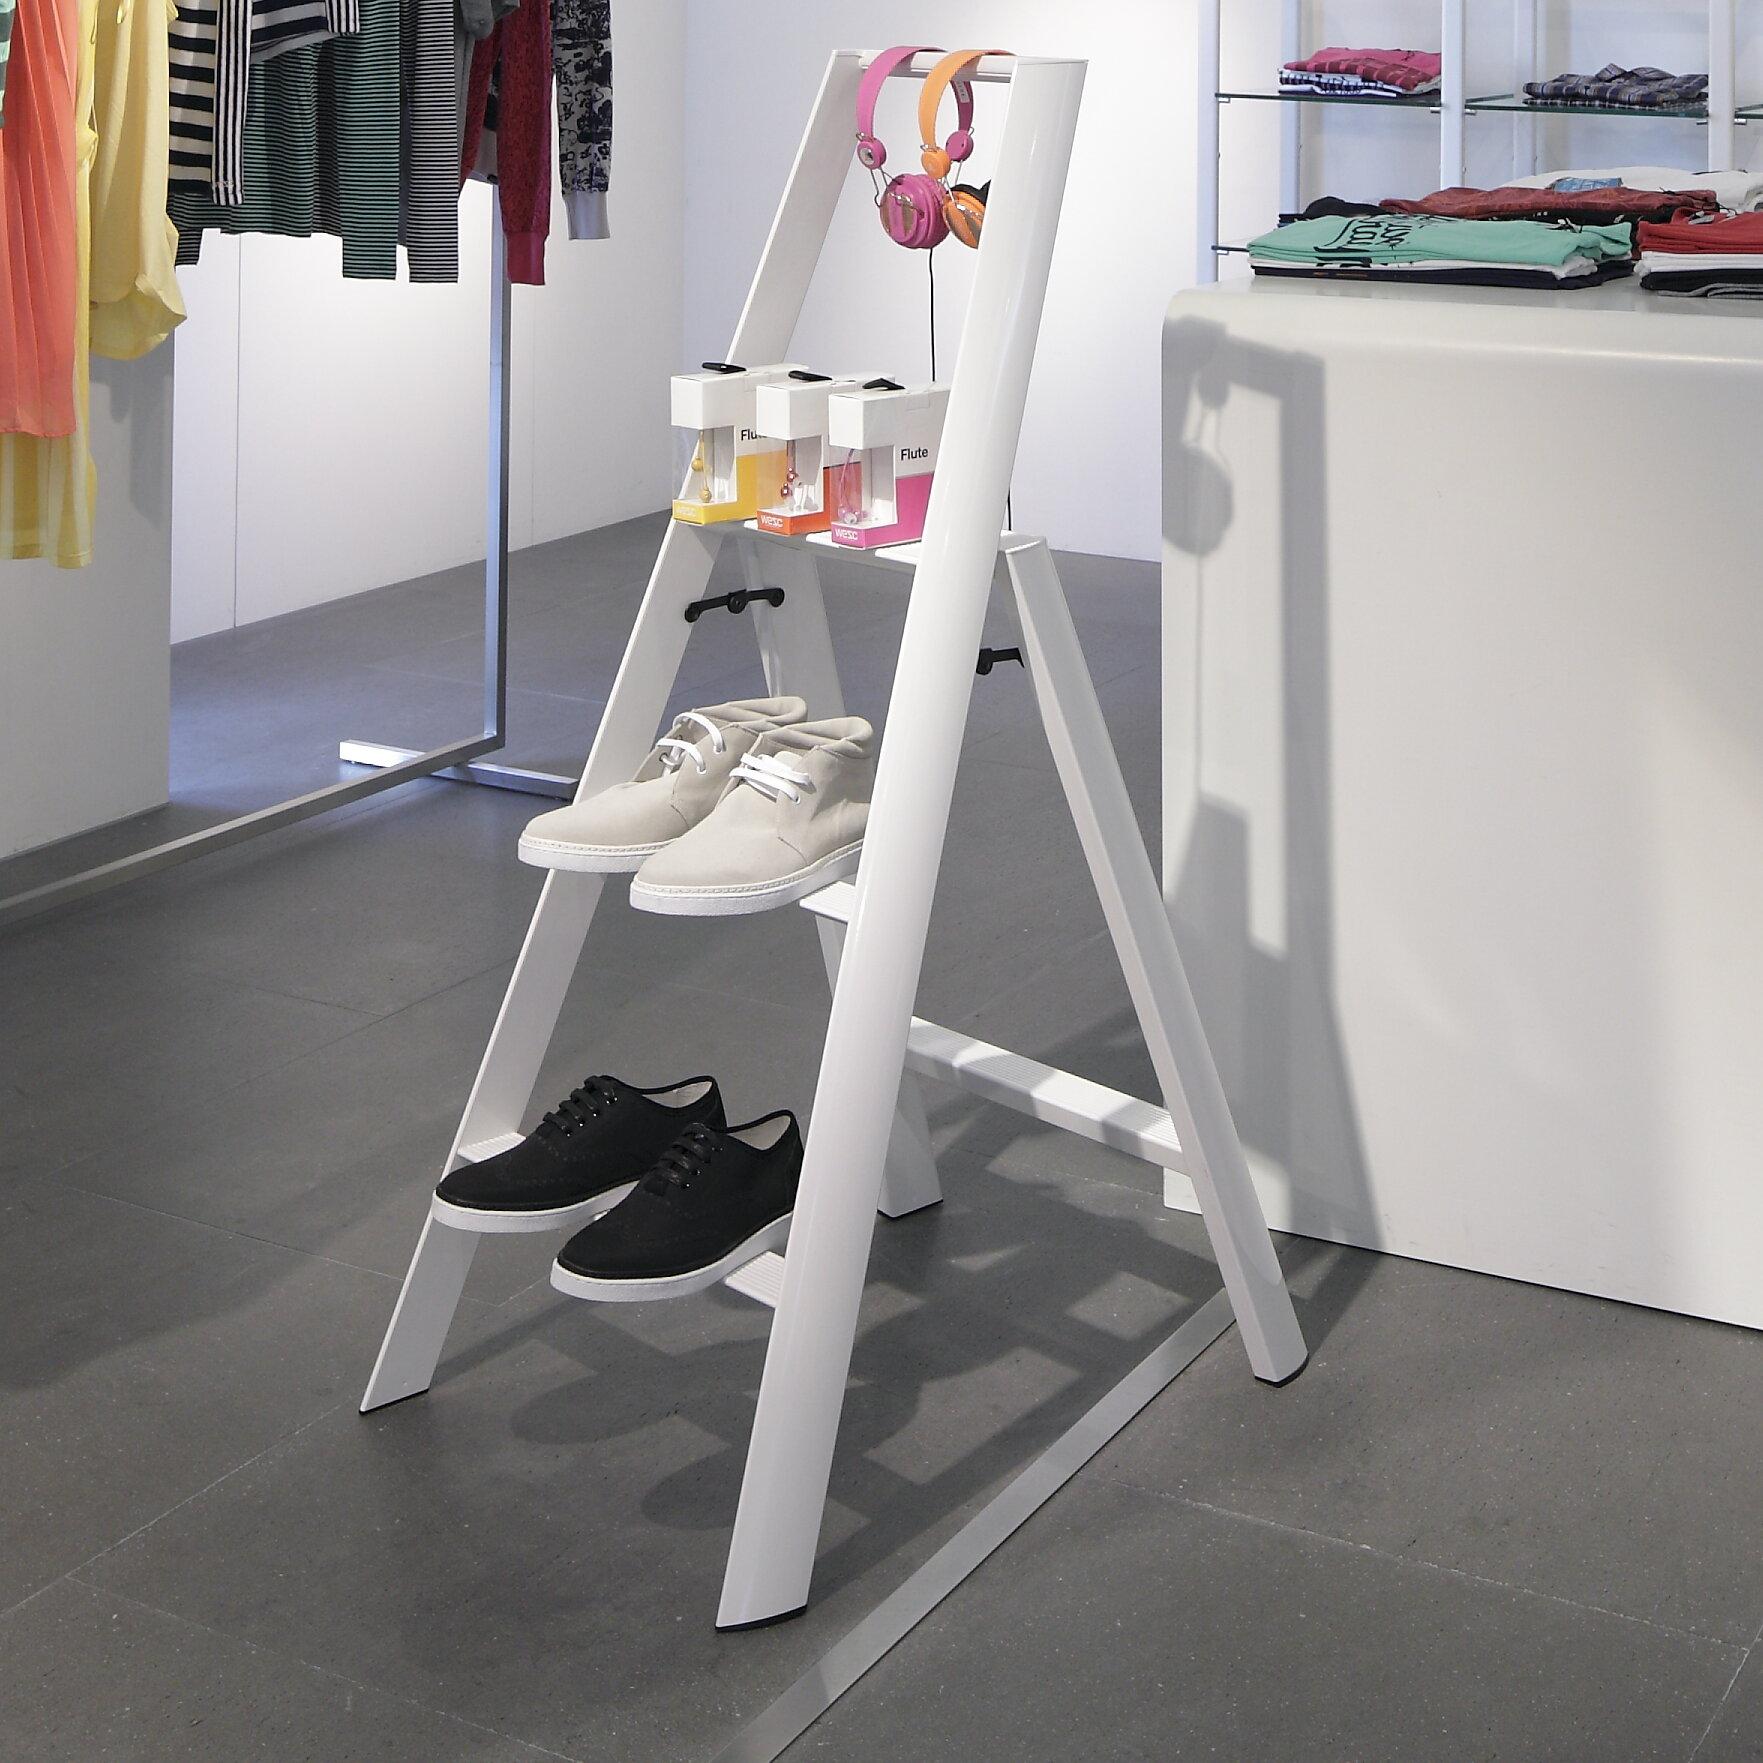 Magnificent 3 Step Aluminum Step Stool With 250 Lb Load Capacity Creativecarmelina Interior Chair Design Creativecarmelinacom